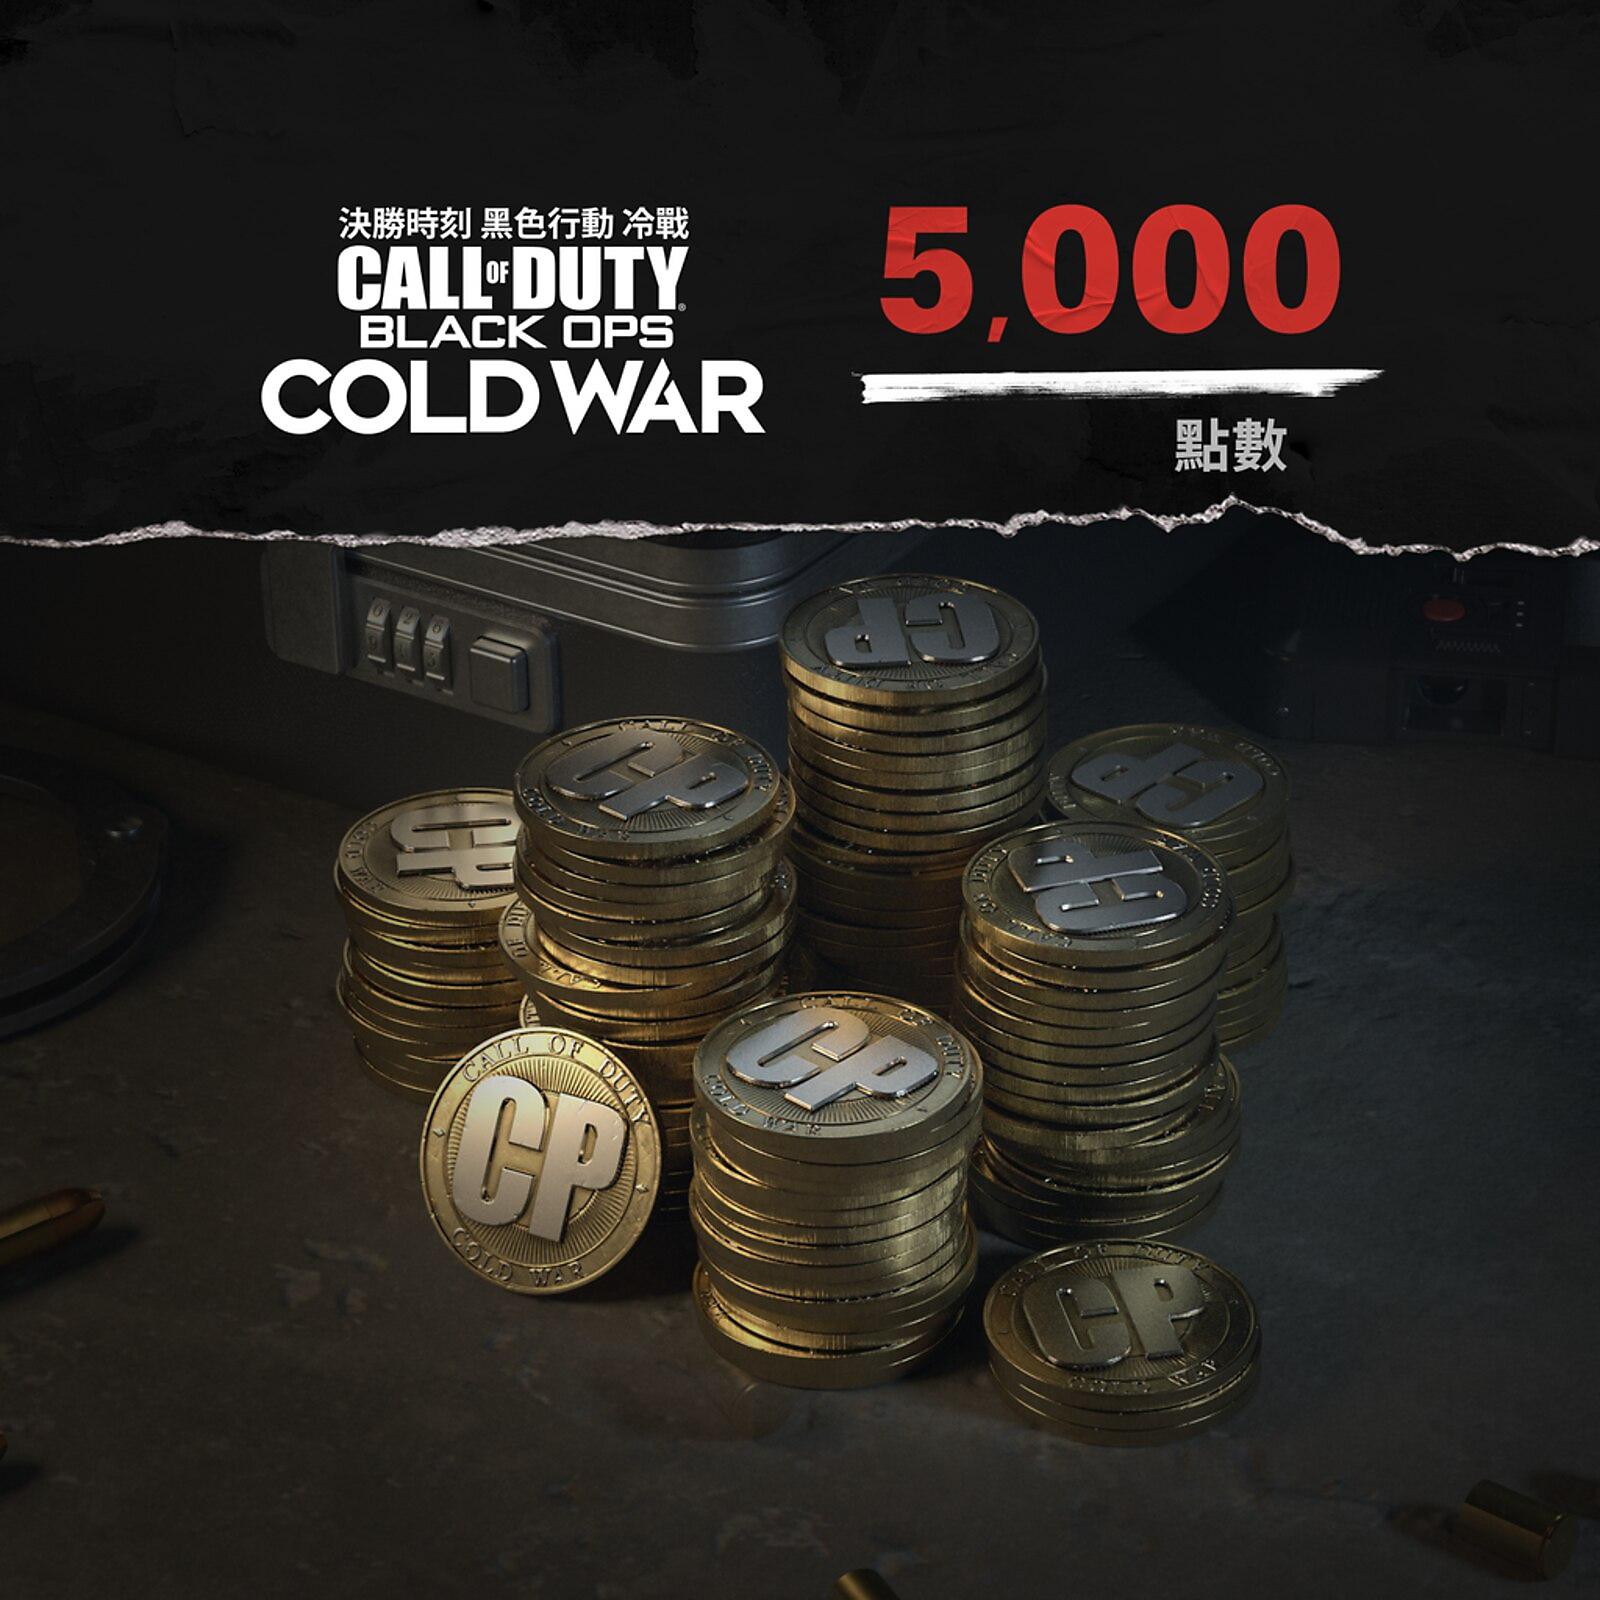 Call of Duty Black Ops Cold War points 5000 packshot